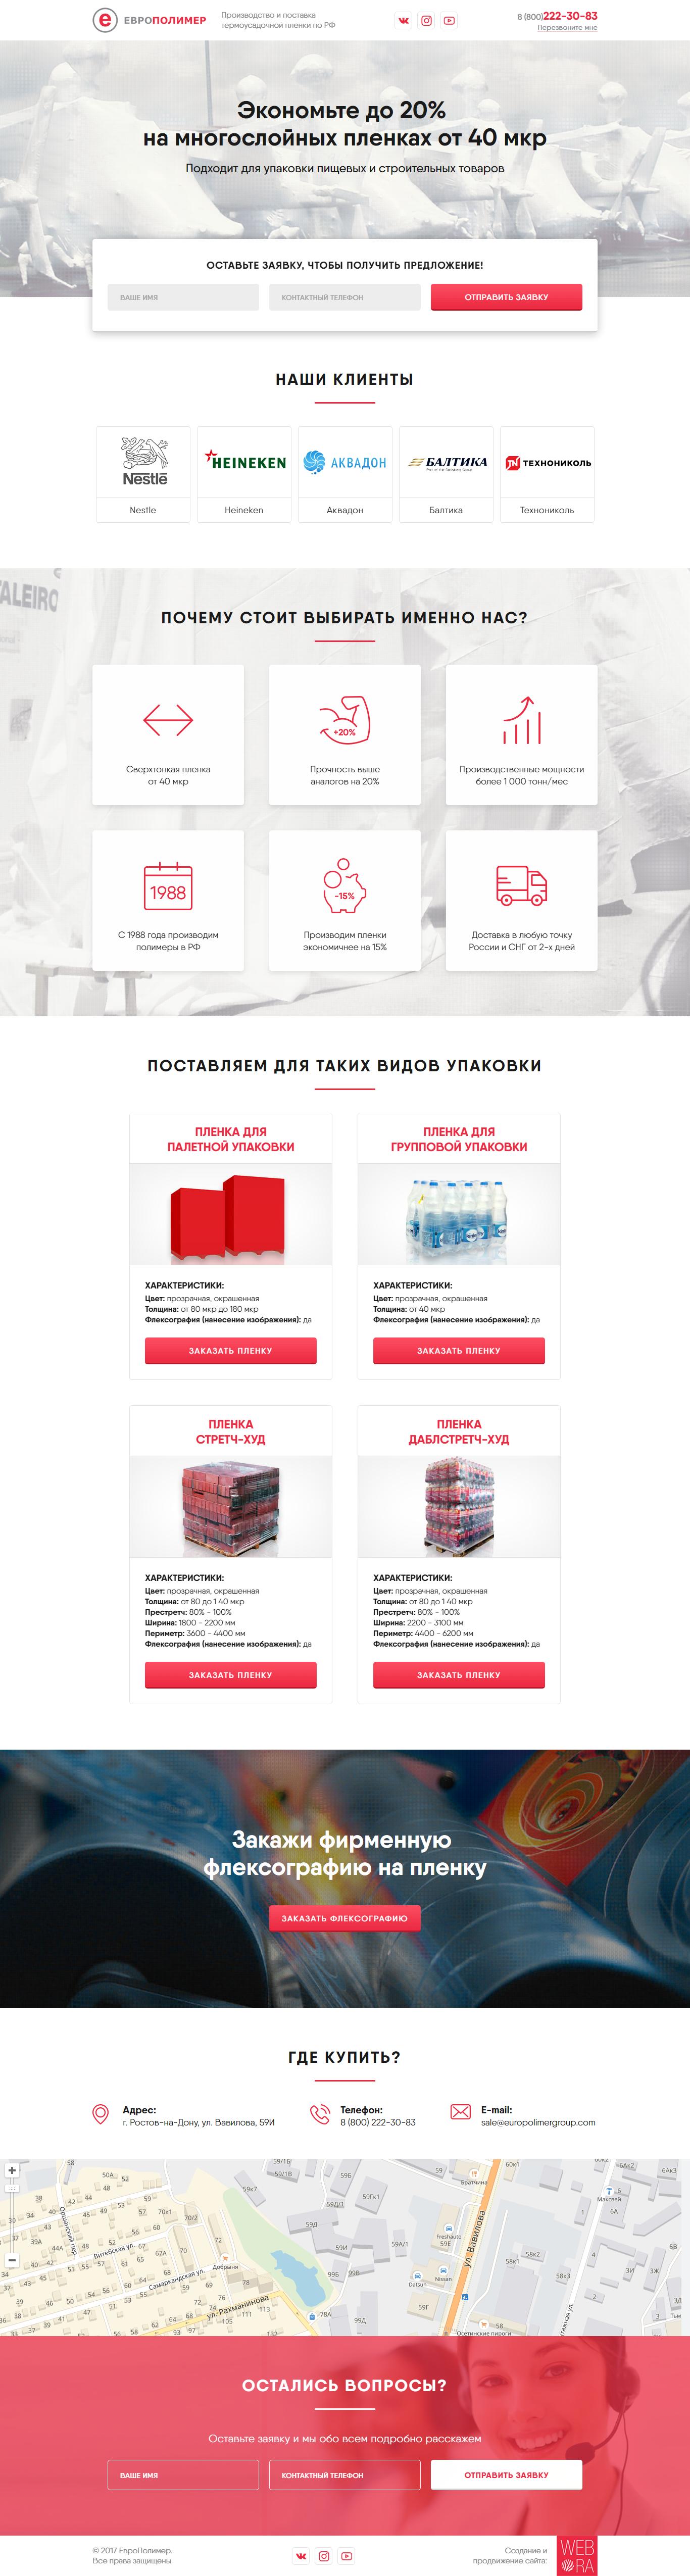 Разработка лендинга дя компании Европолимер - производство пленки